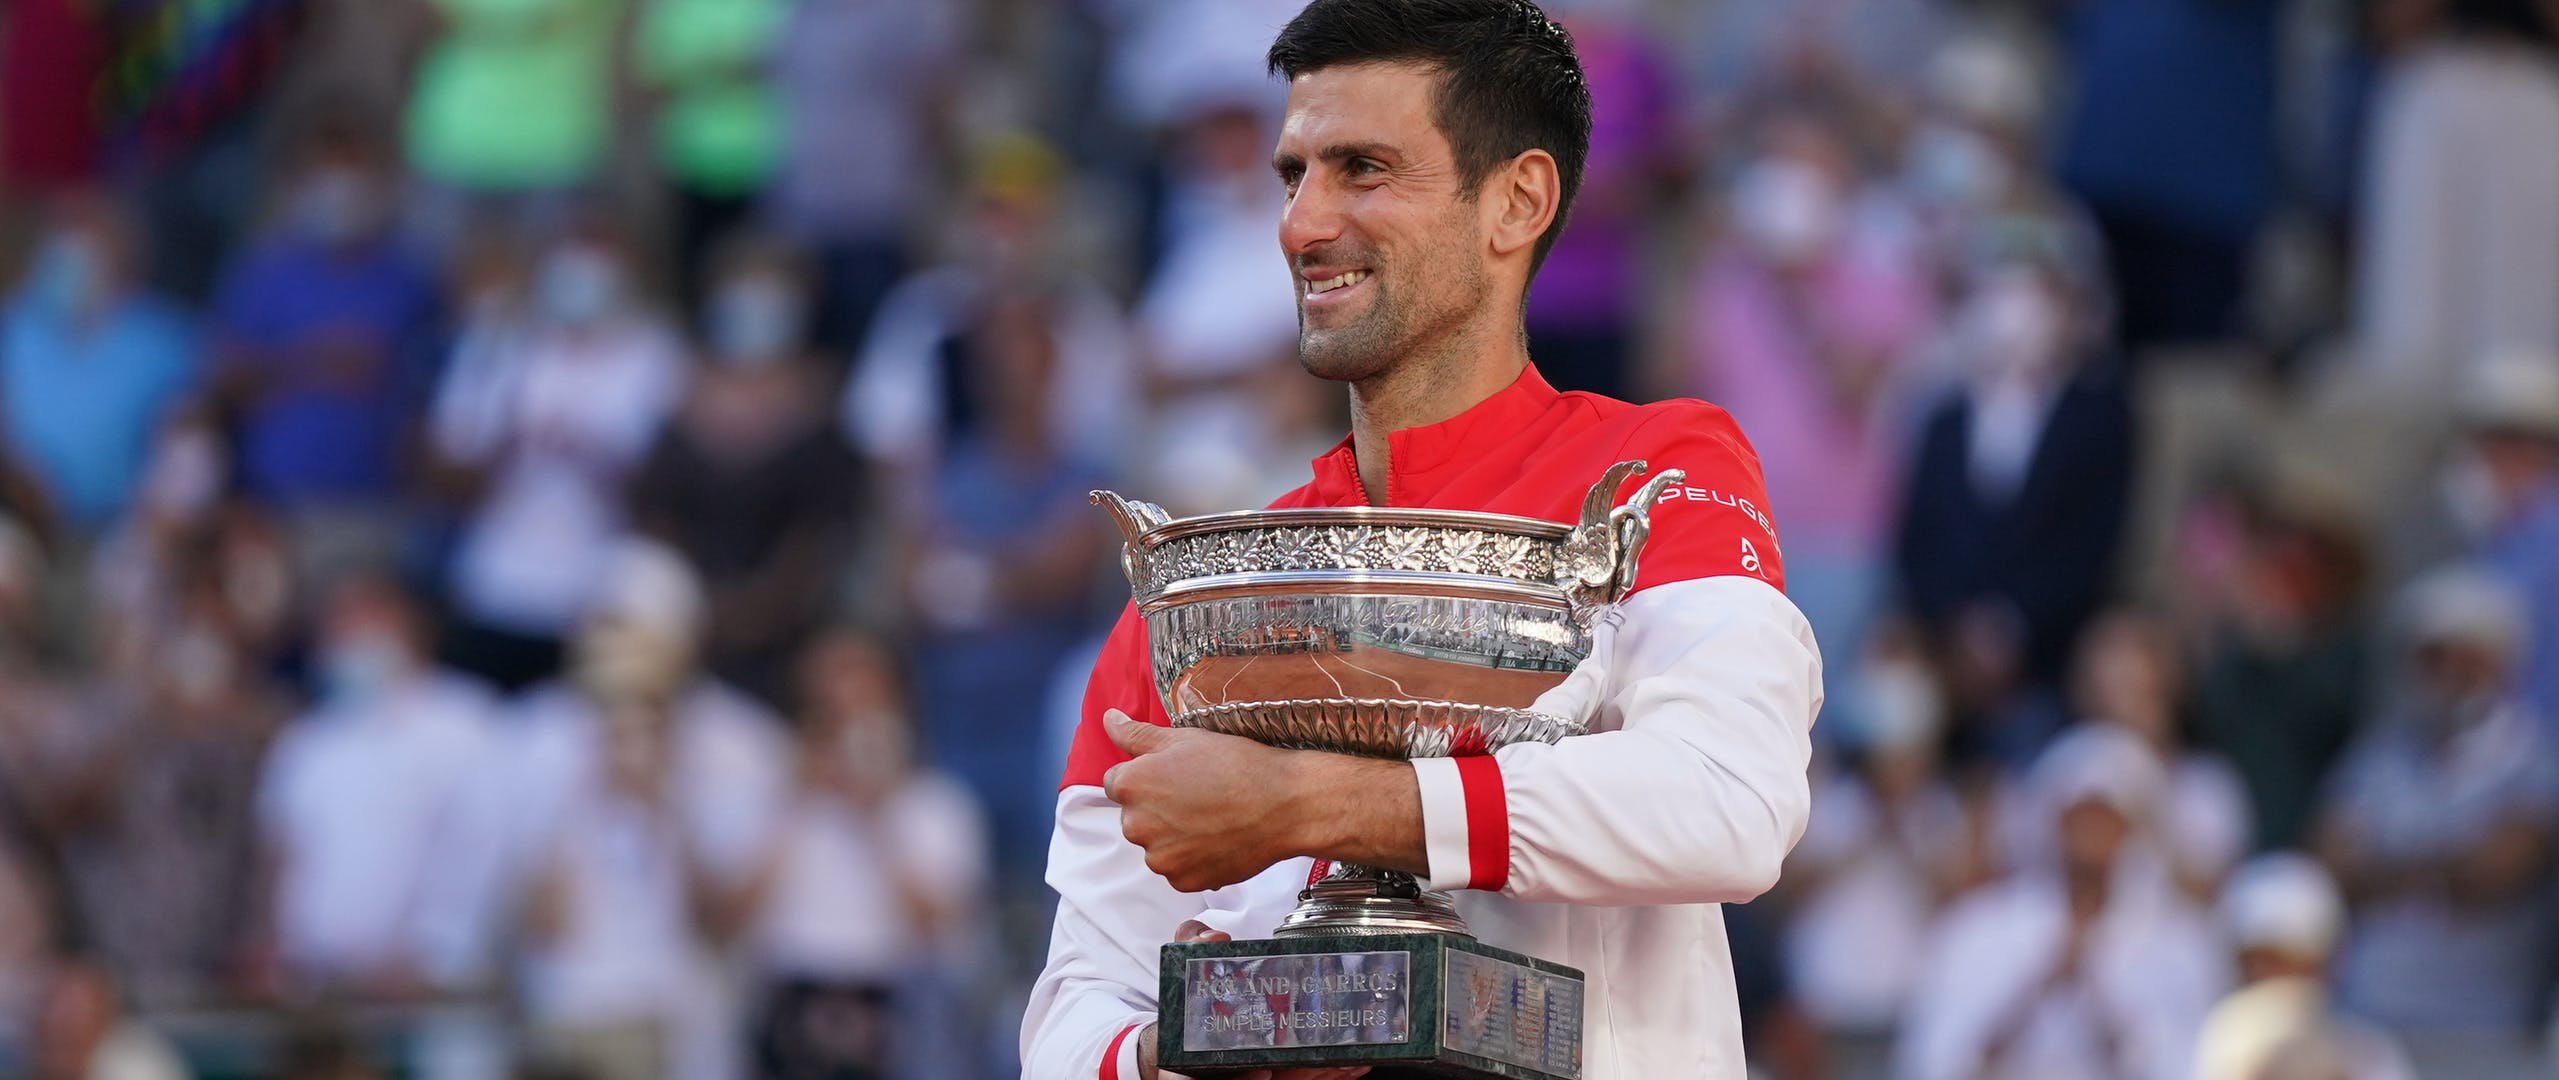 Novak Djokovic, Roland Garros 2021 trophy final